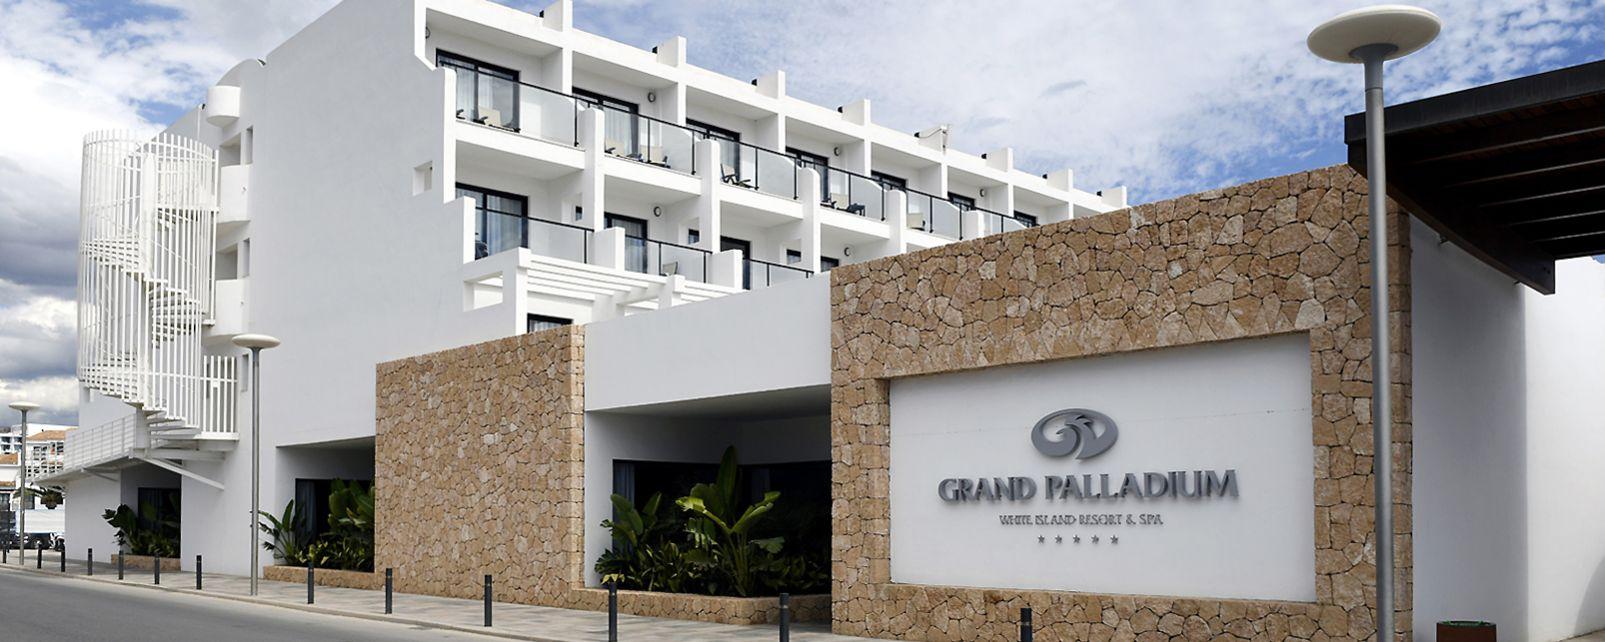 Hôtel Grand Palladium Palace Ibiza Resort